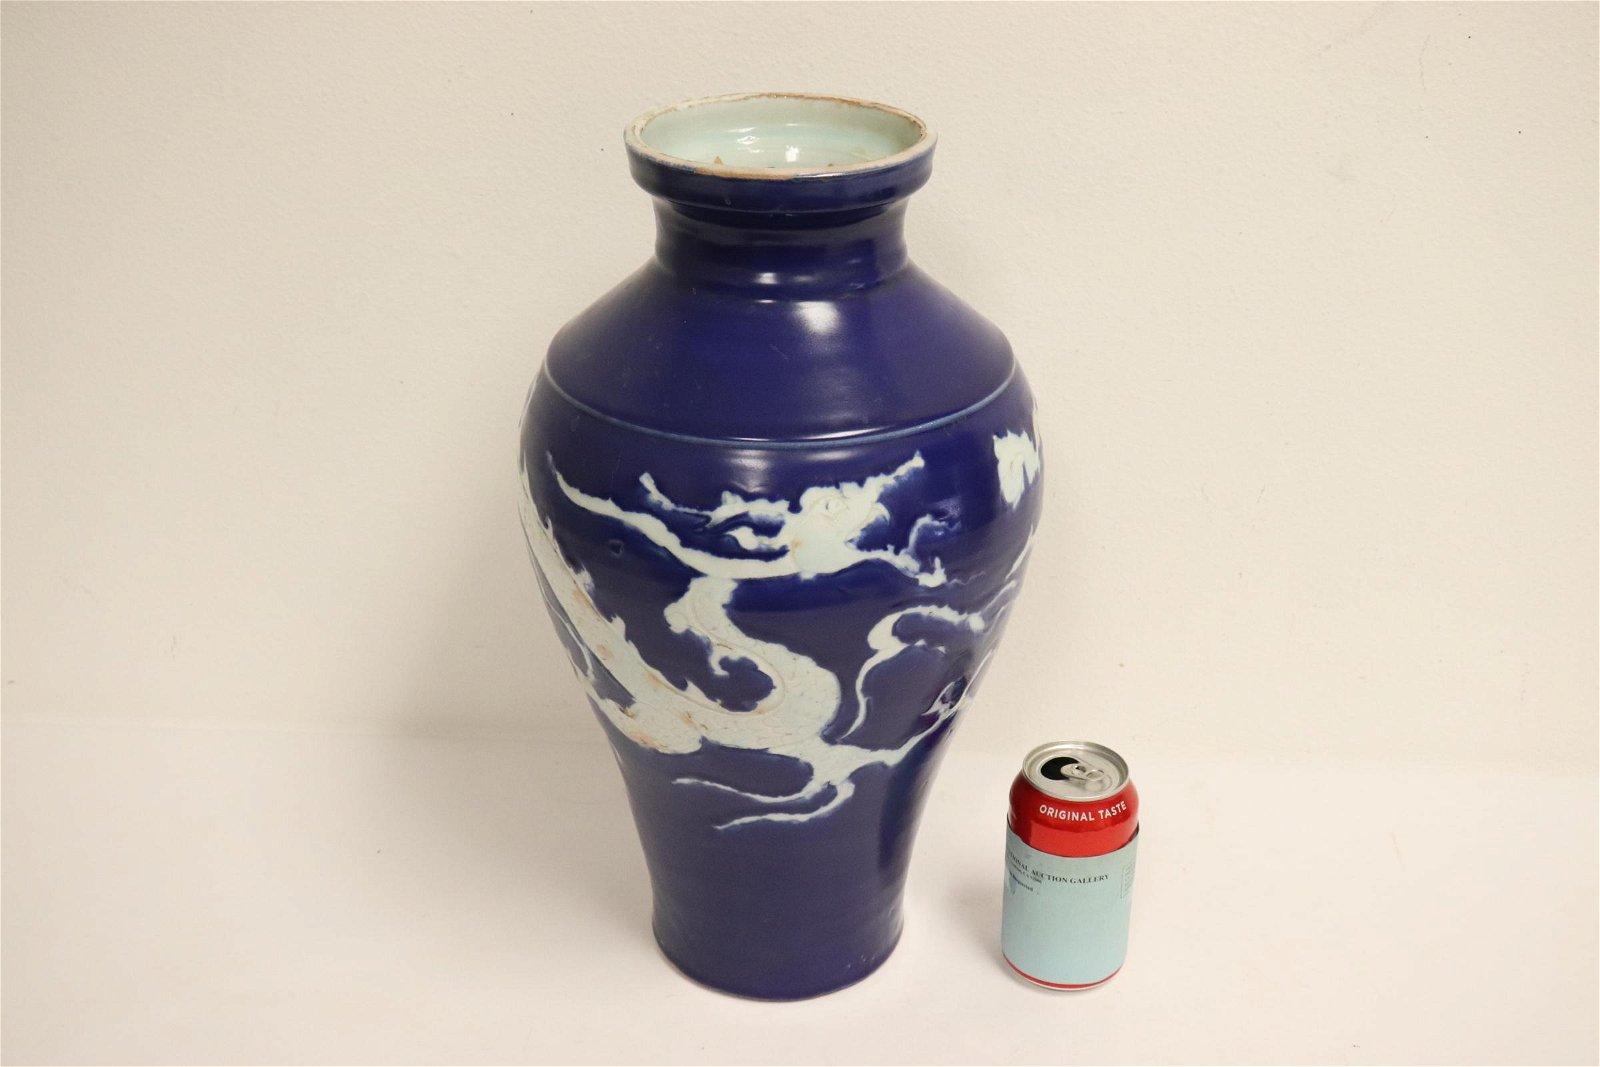 Chinese white on blue porcelain vase